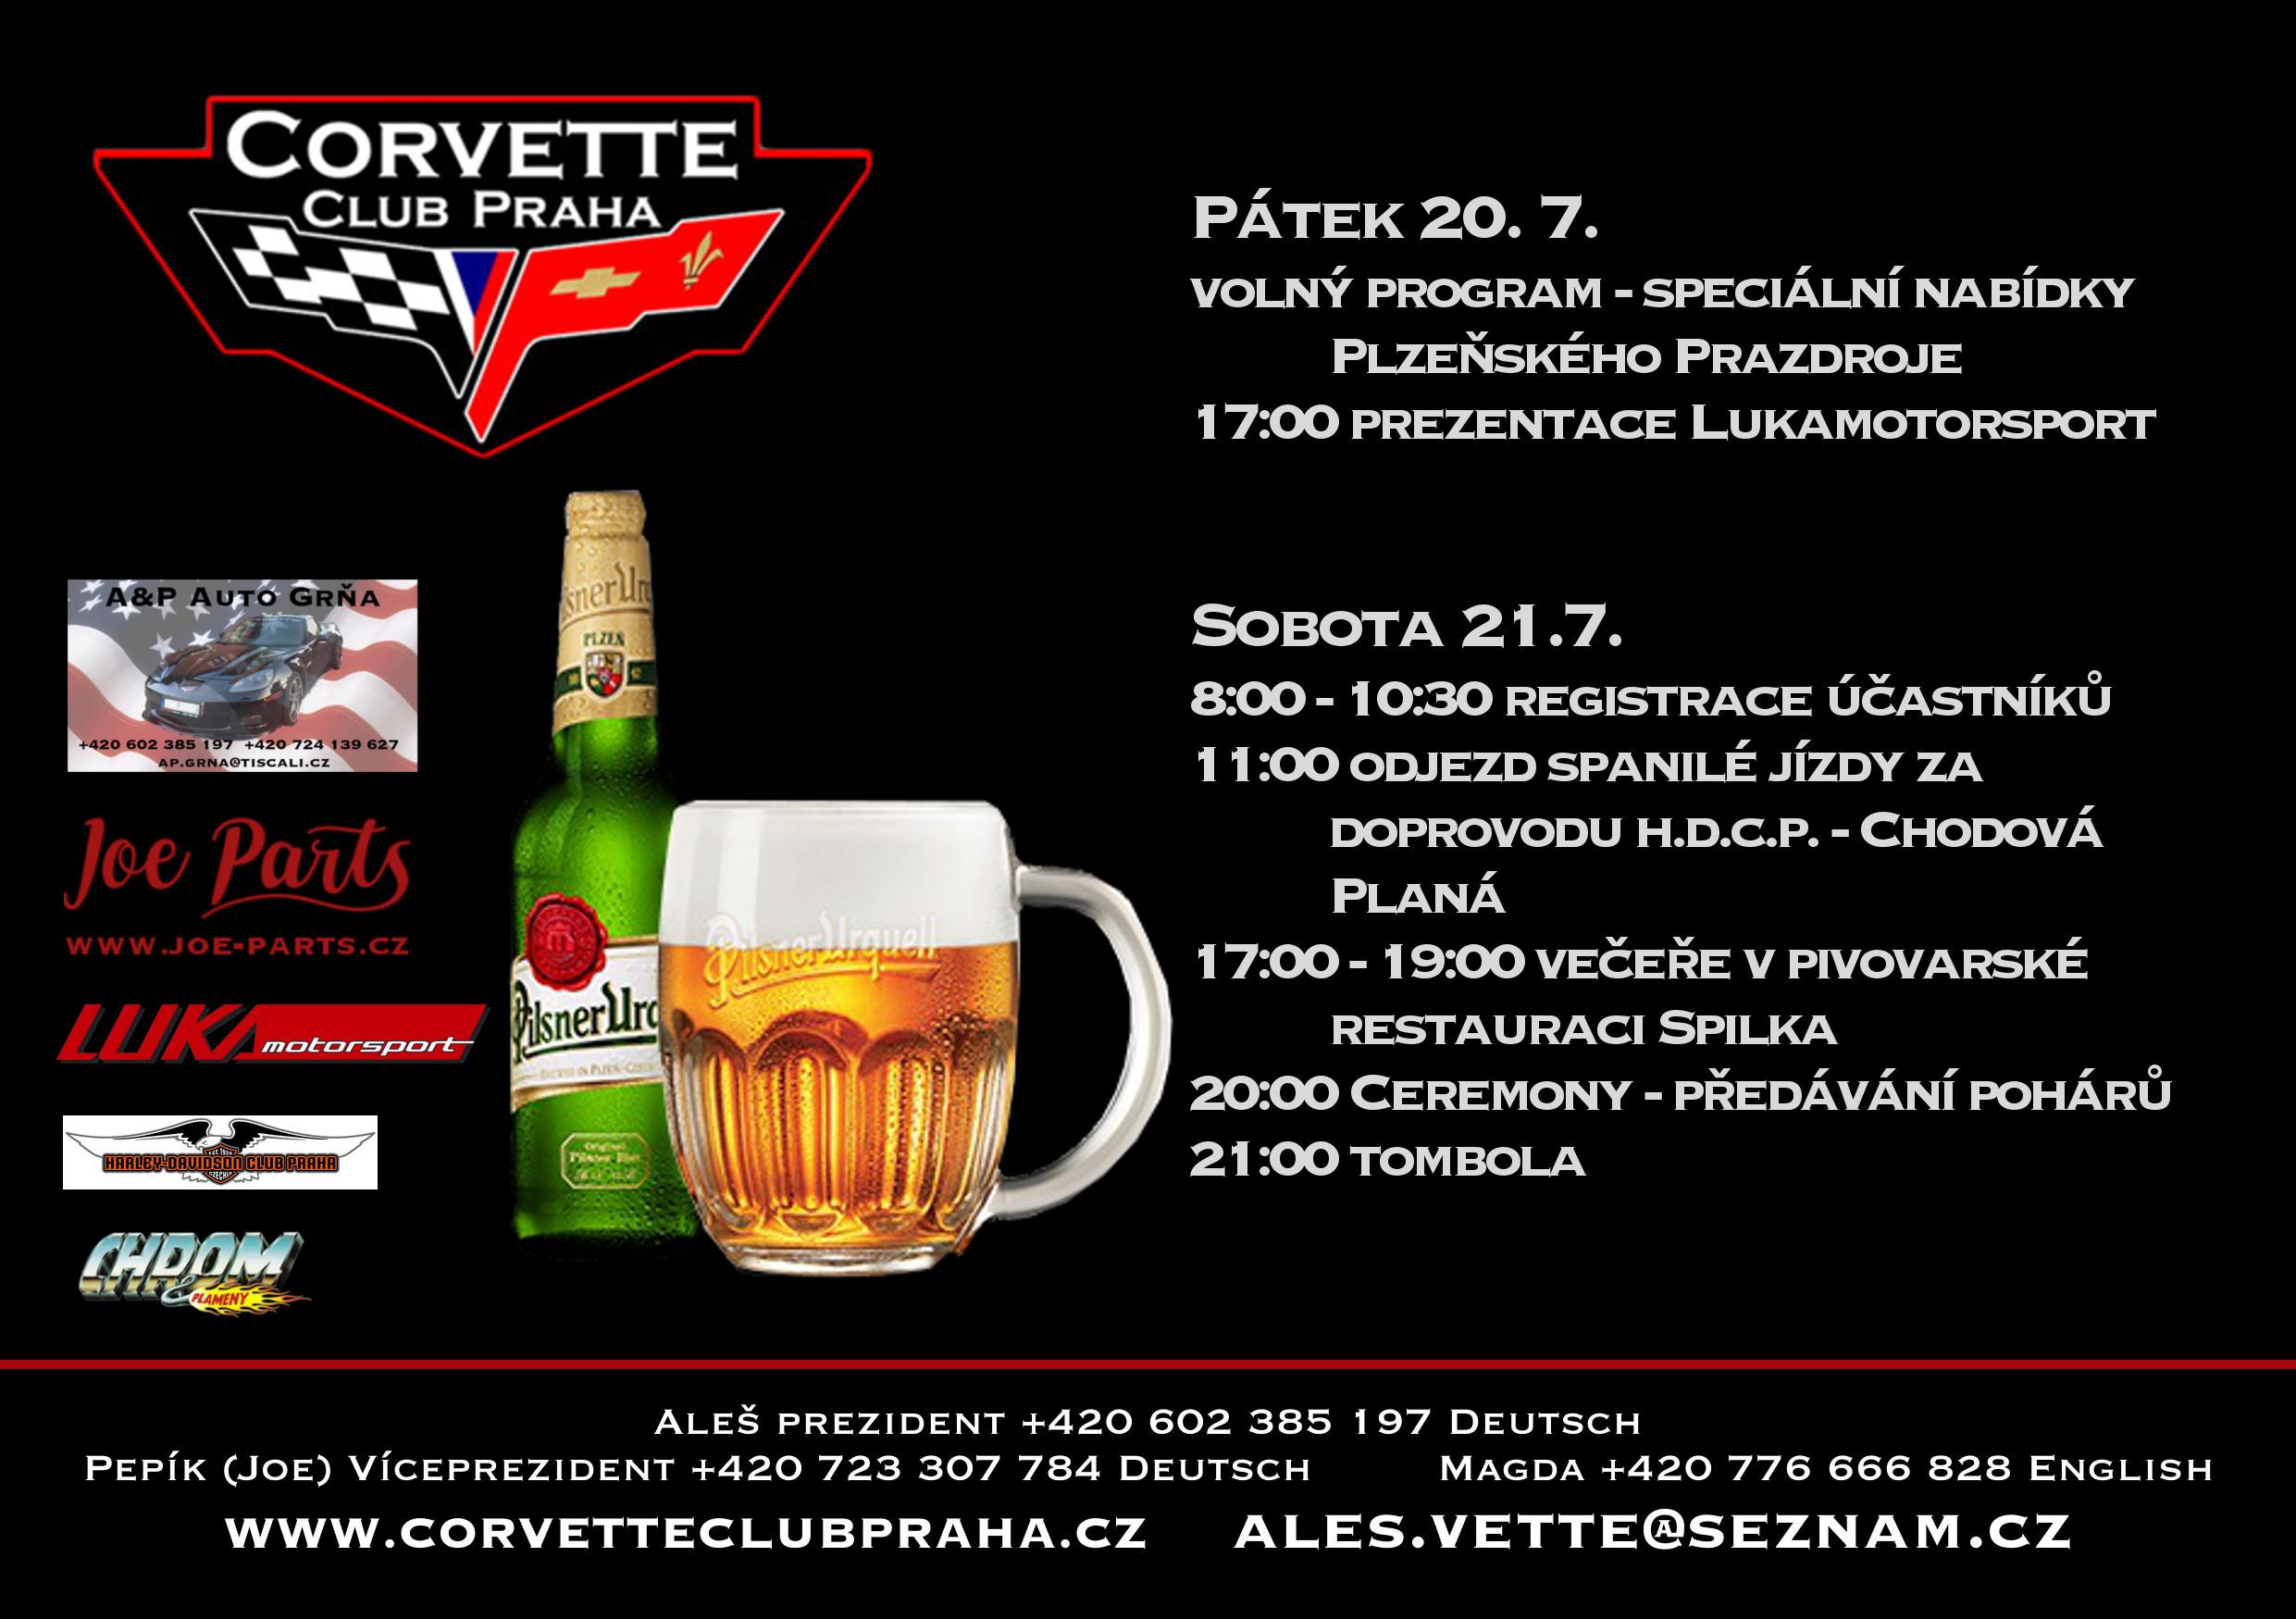 18. Mezinárodní sraz Corvette Club Praha - Program